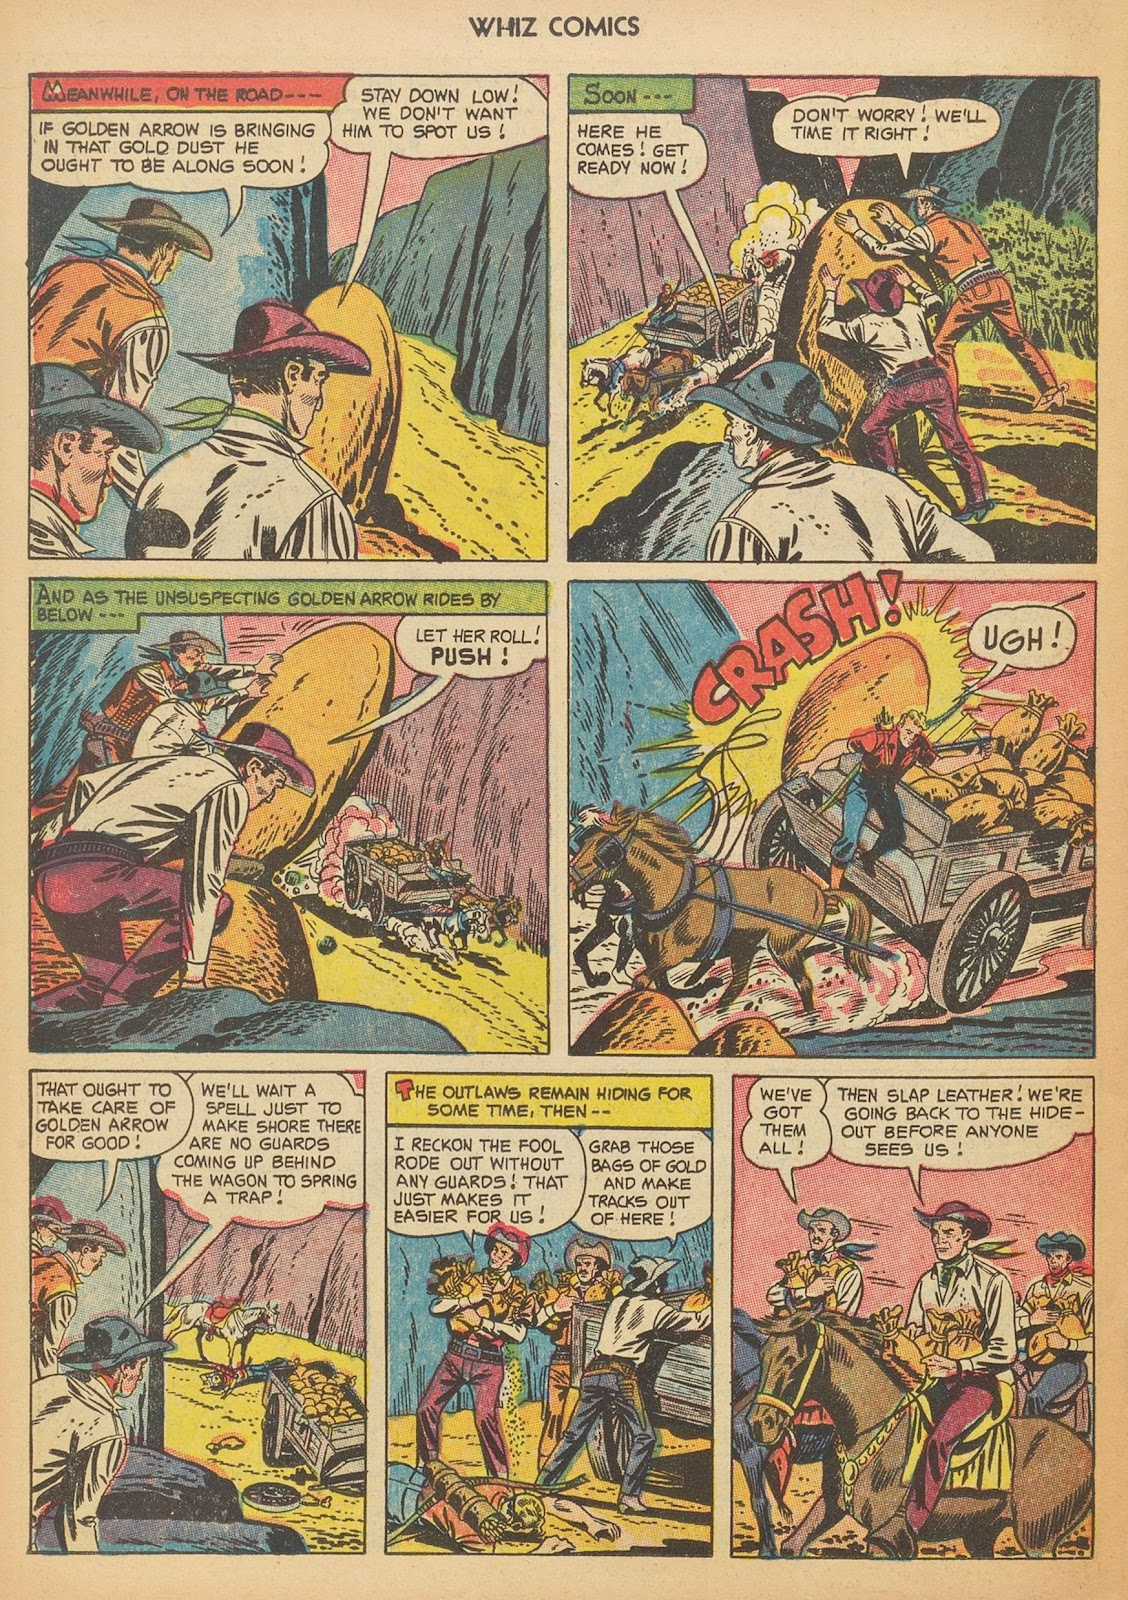 Read online WHIZ Comics comic -  Issue #153 - 22